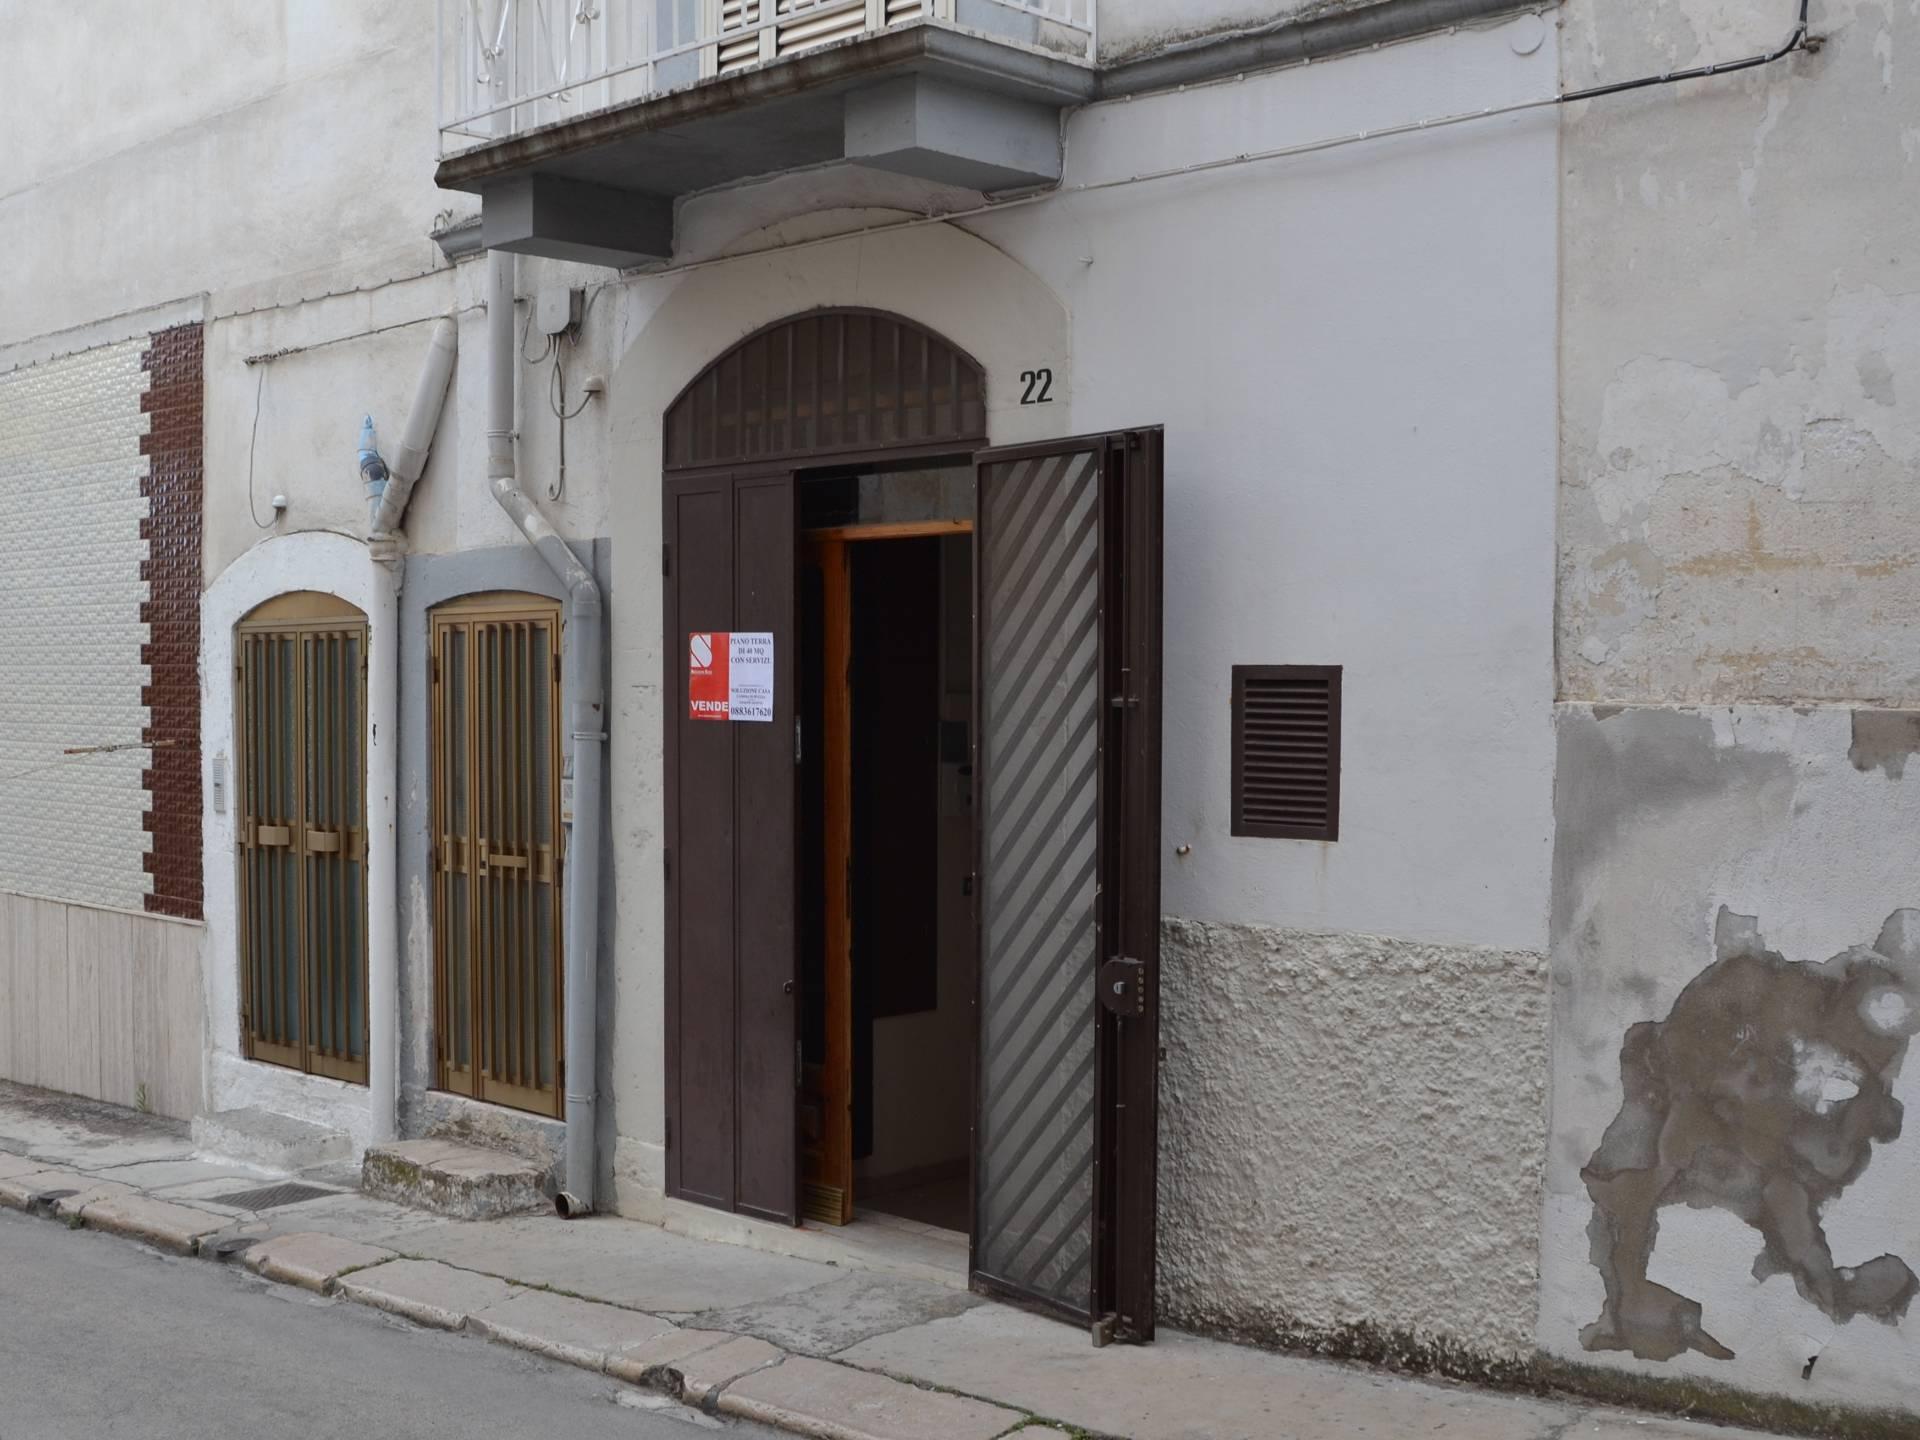 Casa singola in vendita a canosa di puglia cod r414 - Piano casa regione puglia ...